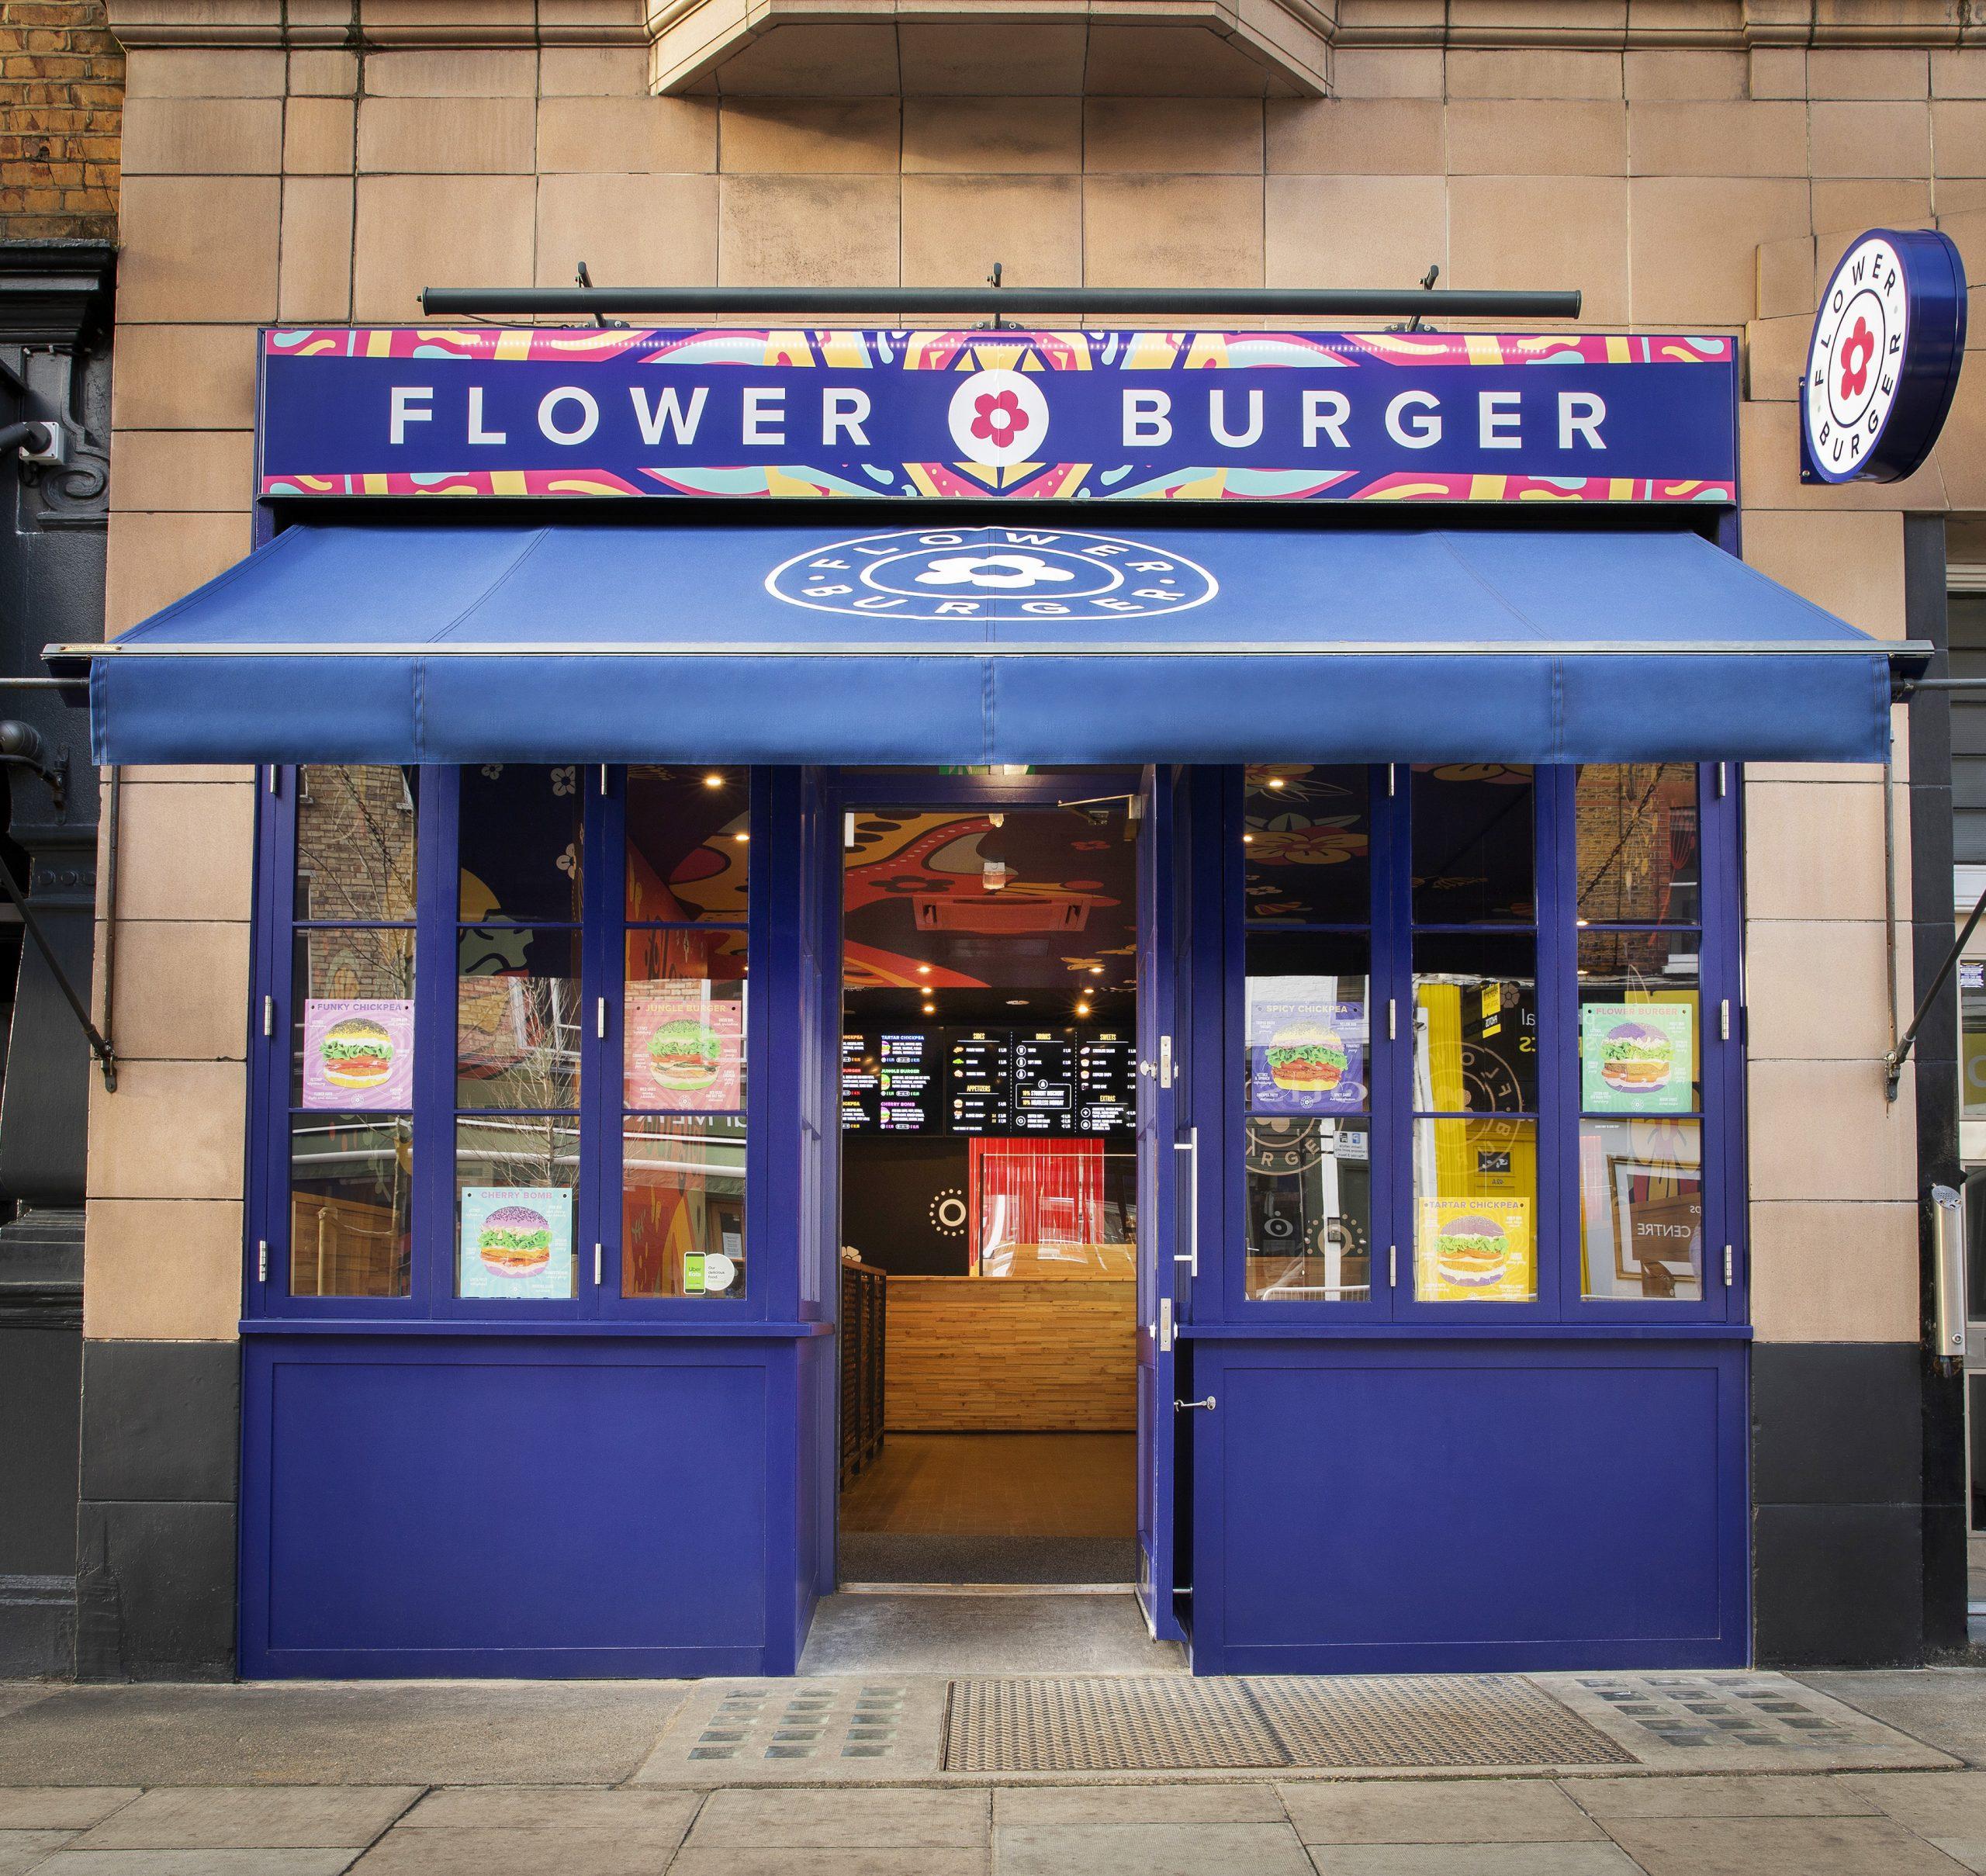 Shop Awning for Flower Burger